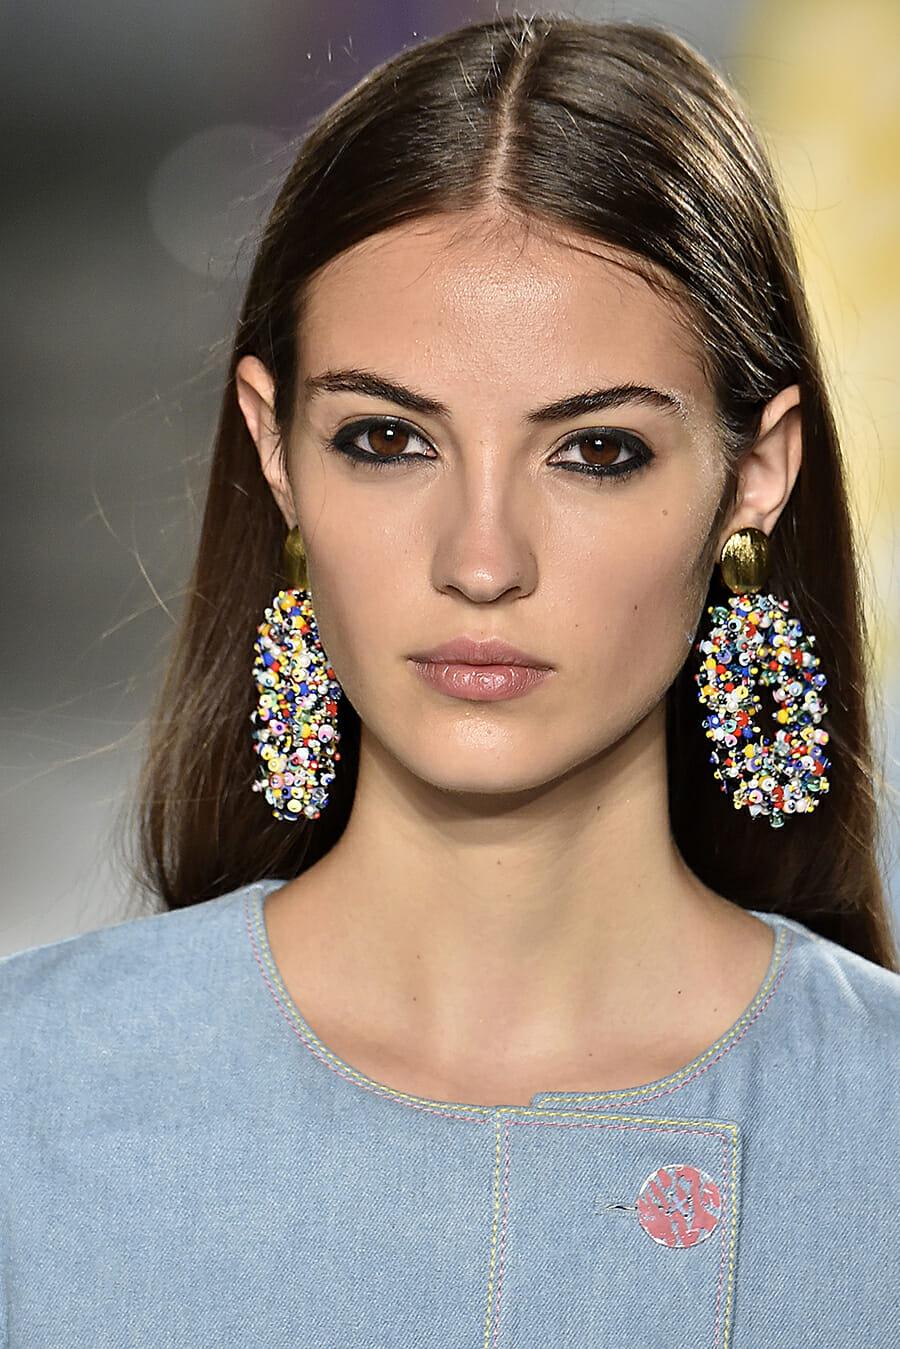 Carolina-Herrera-New-York-Fashion-Week-Spring-Summer-2018-NY-September-2017-look12-detail1